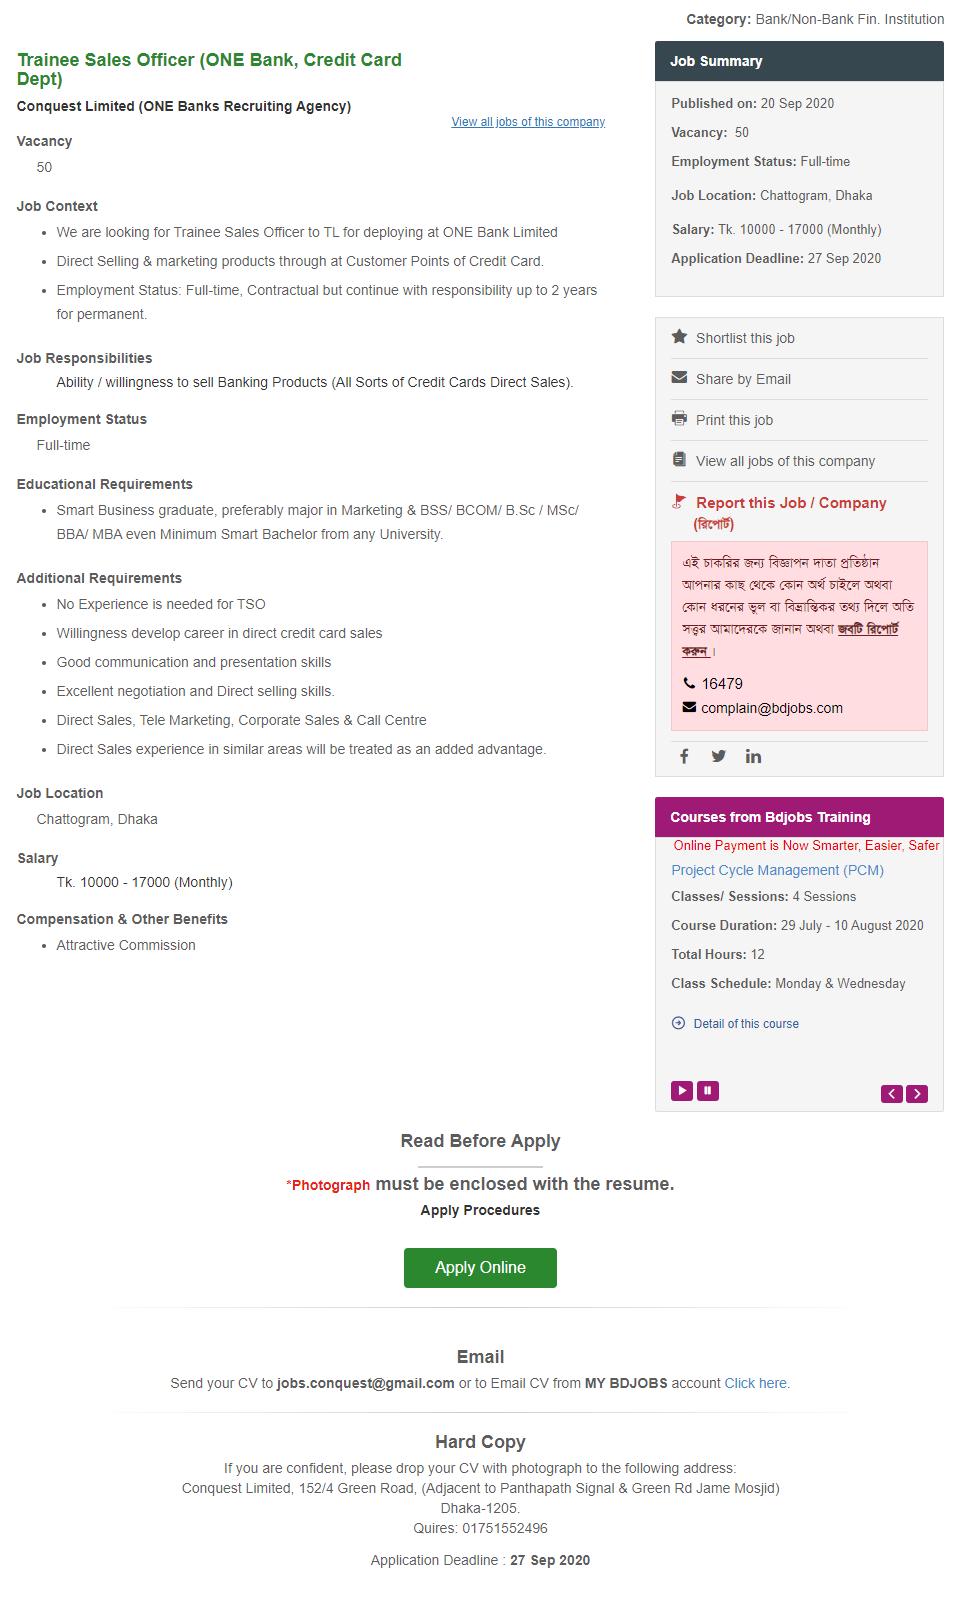 One Bank Recruiting Conquest Job Circular